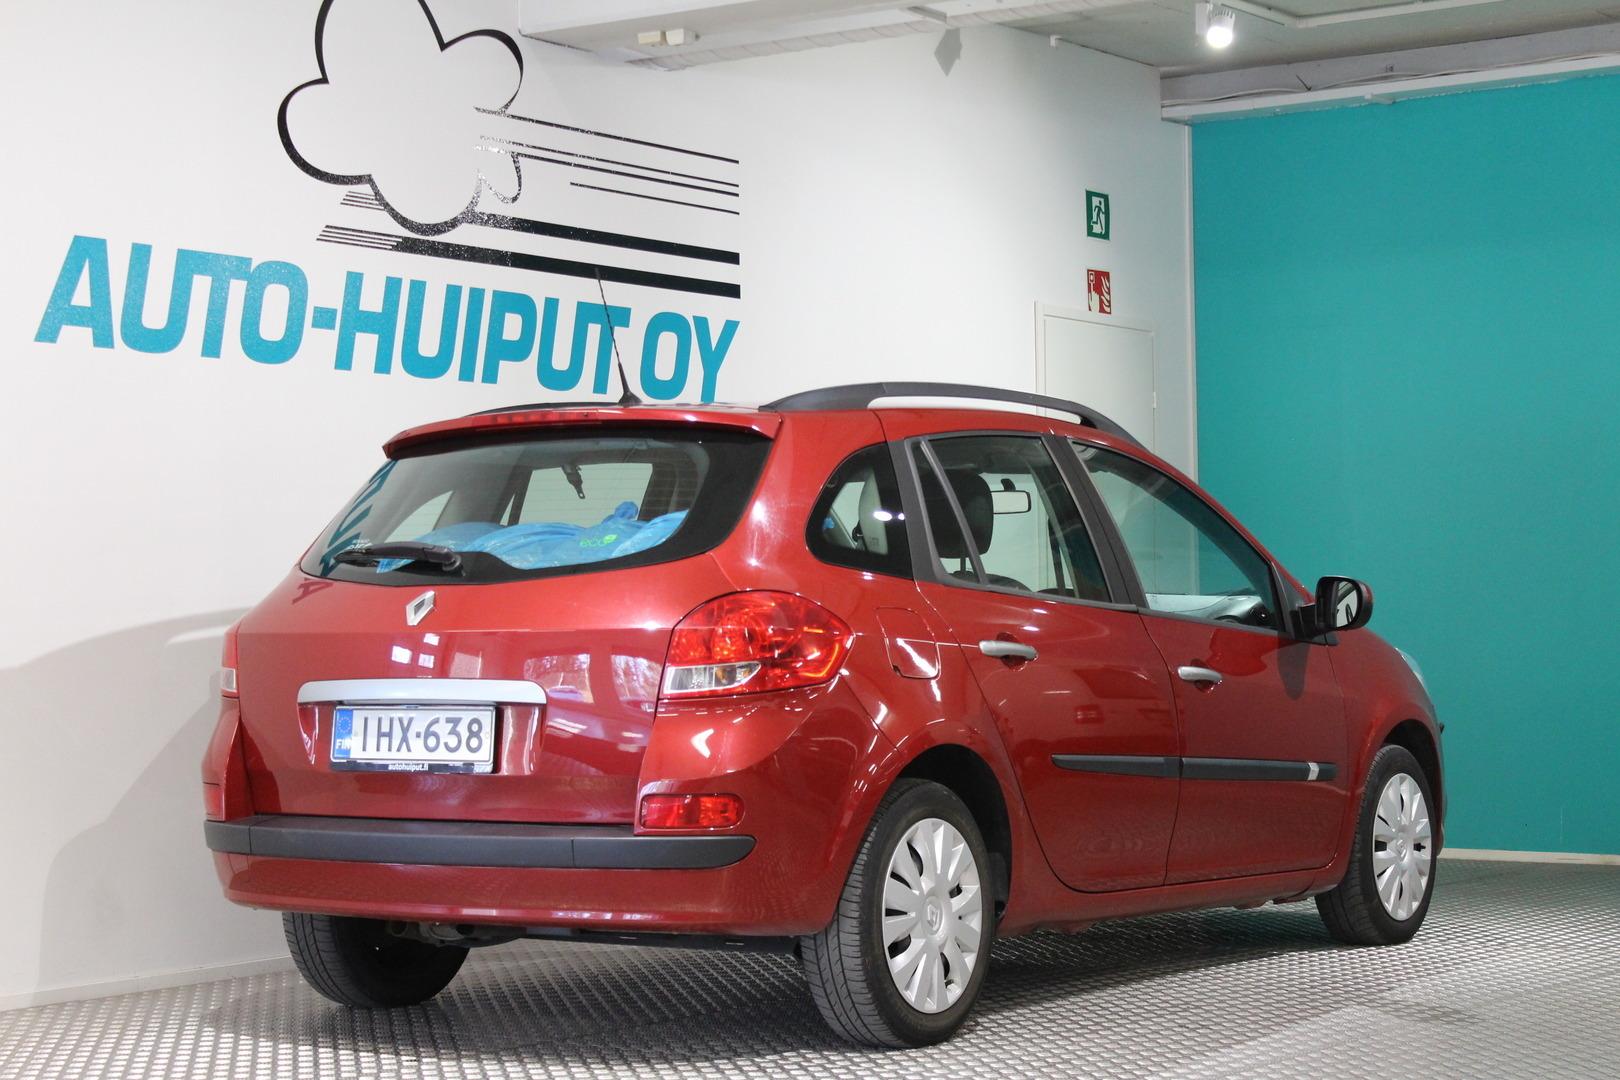 Renault Clio Sport Tourer, Expression 1,2 #Hyvin pidetty! #Vakionopeudensäädin! #Käsiraha alk.0e